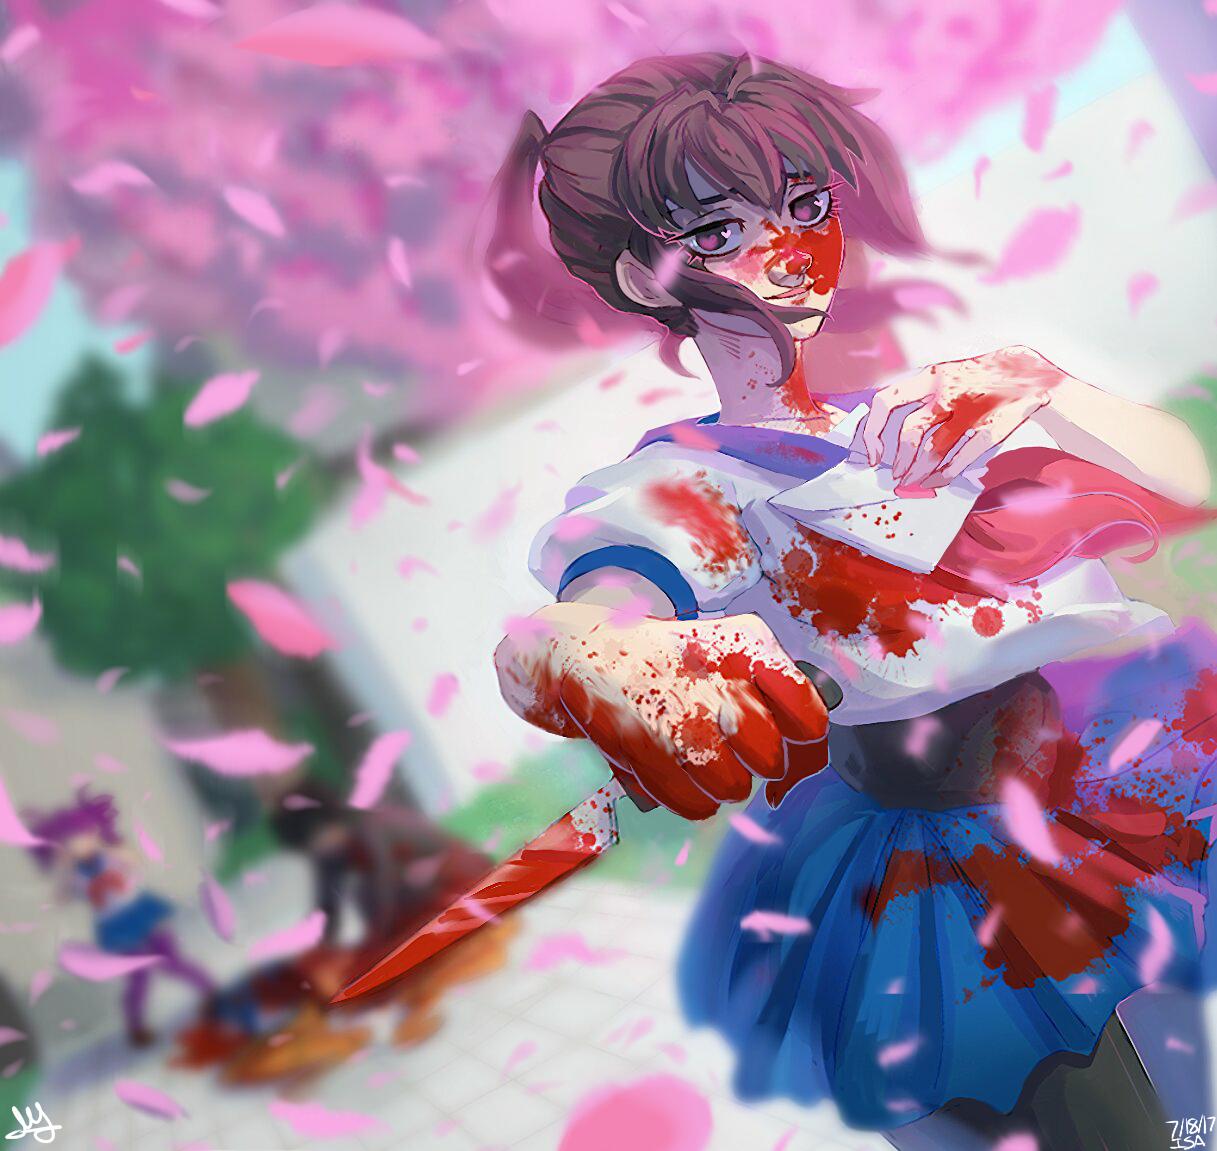 Game development blog yandere classmates anime pinterest nice - Yandere Simulator Development Blog